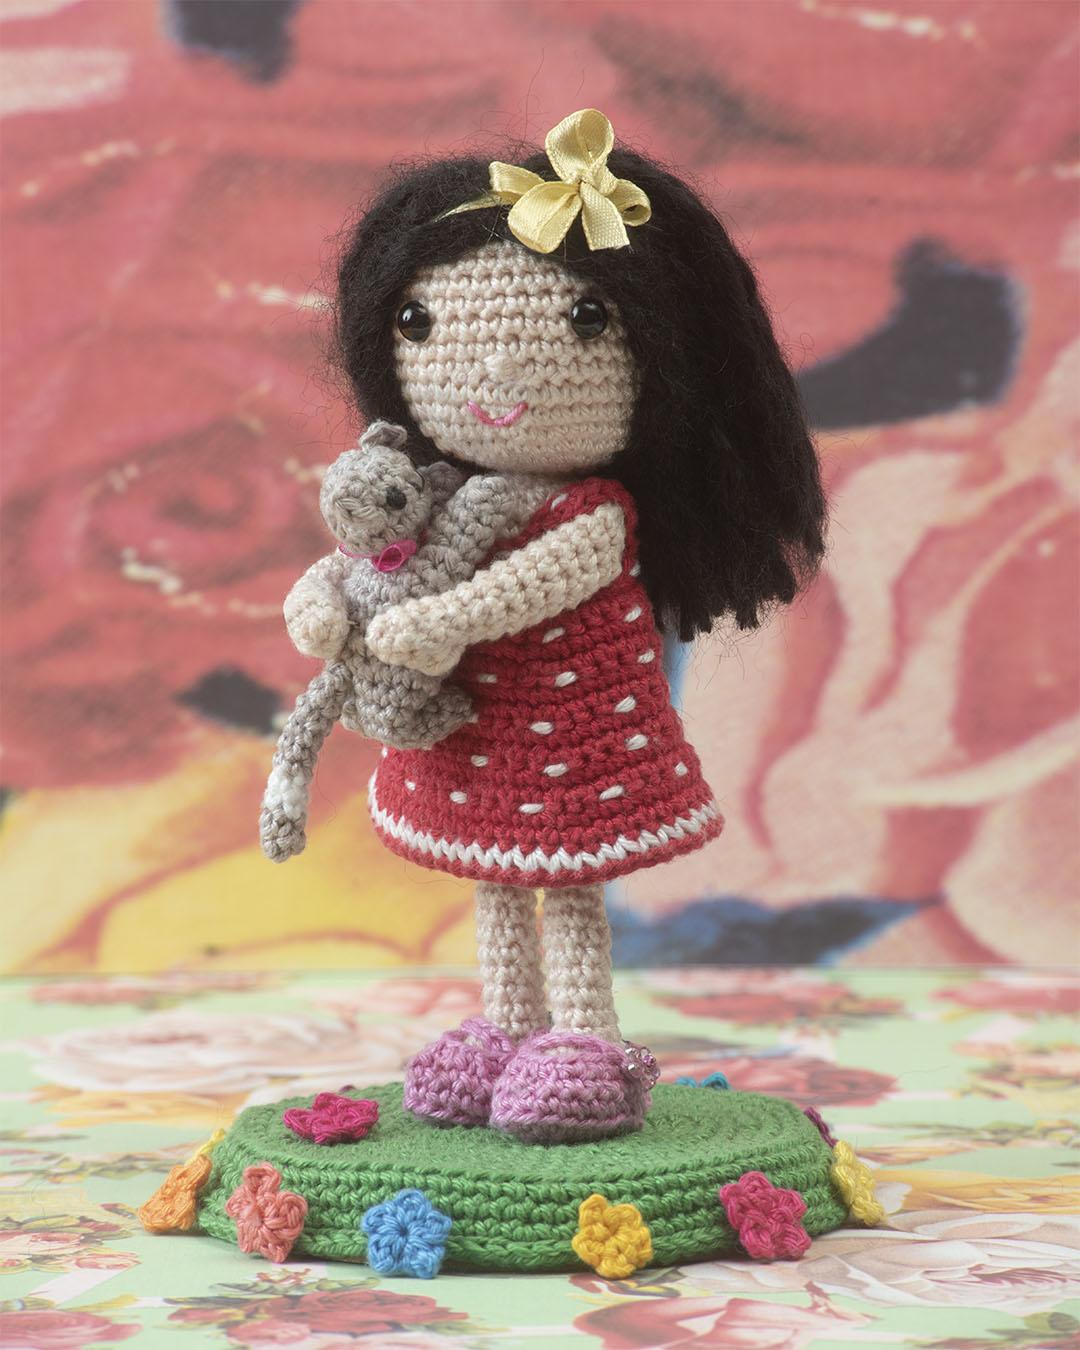 doll with kitten, crochet pattern, cotton,